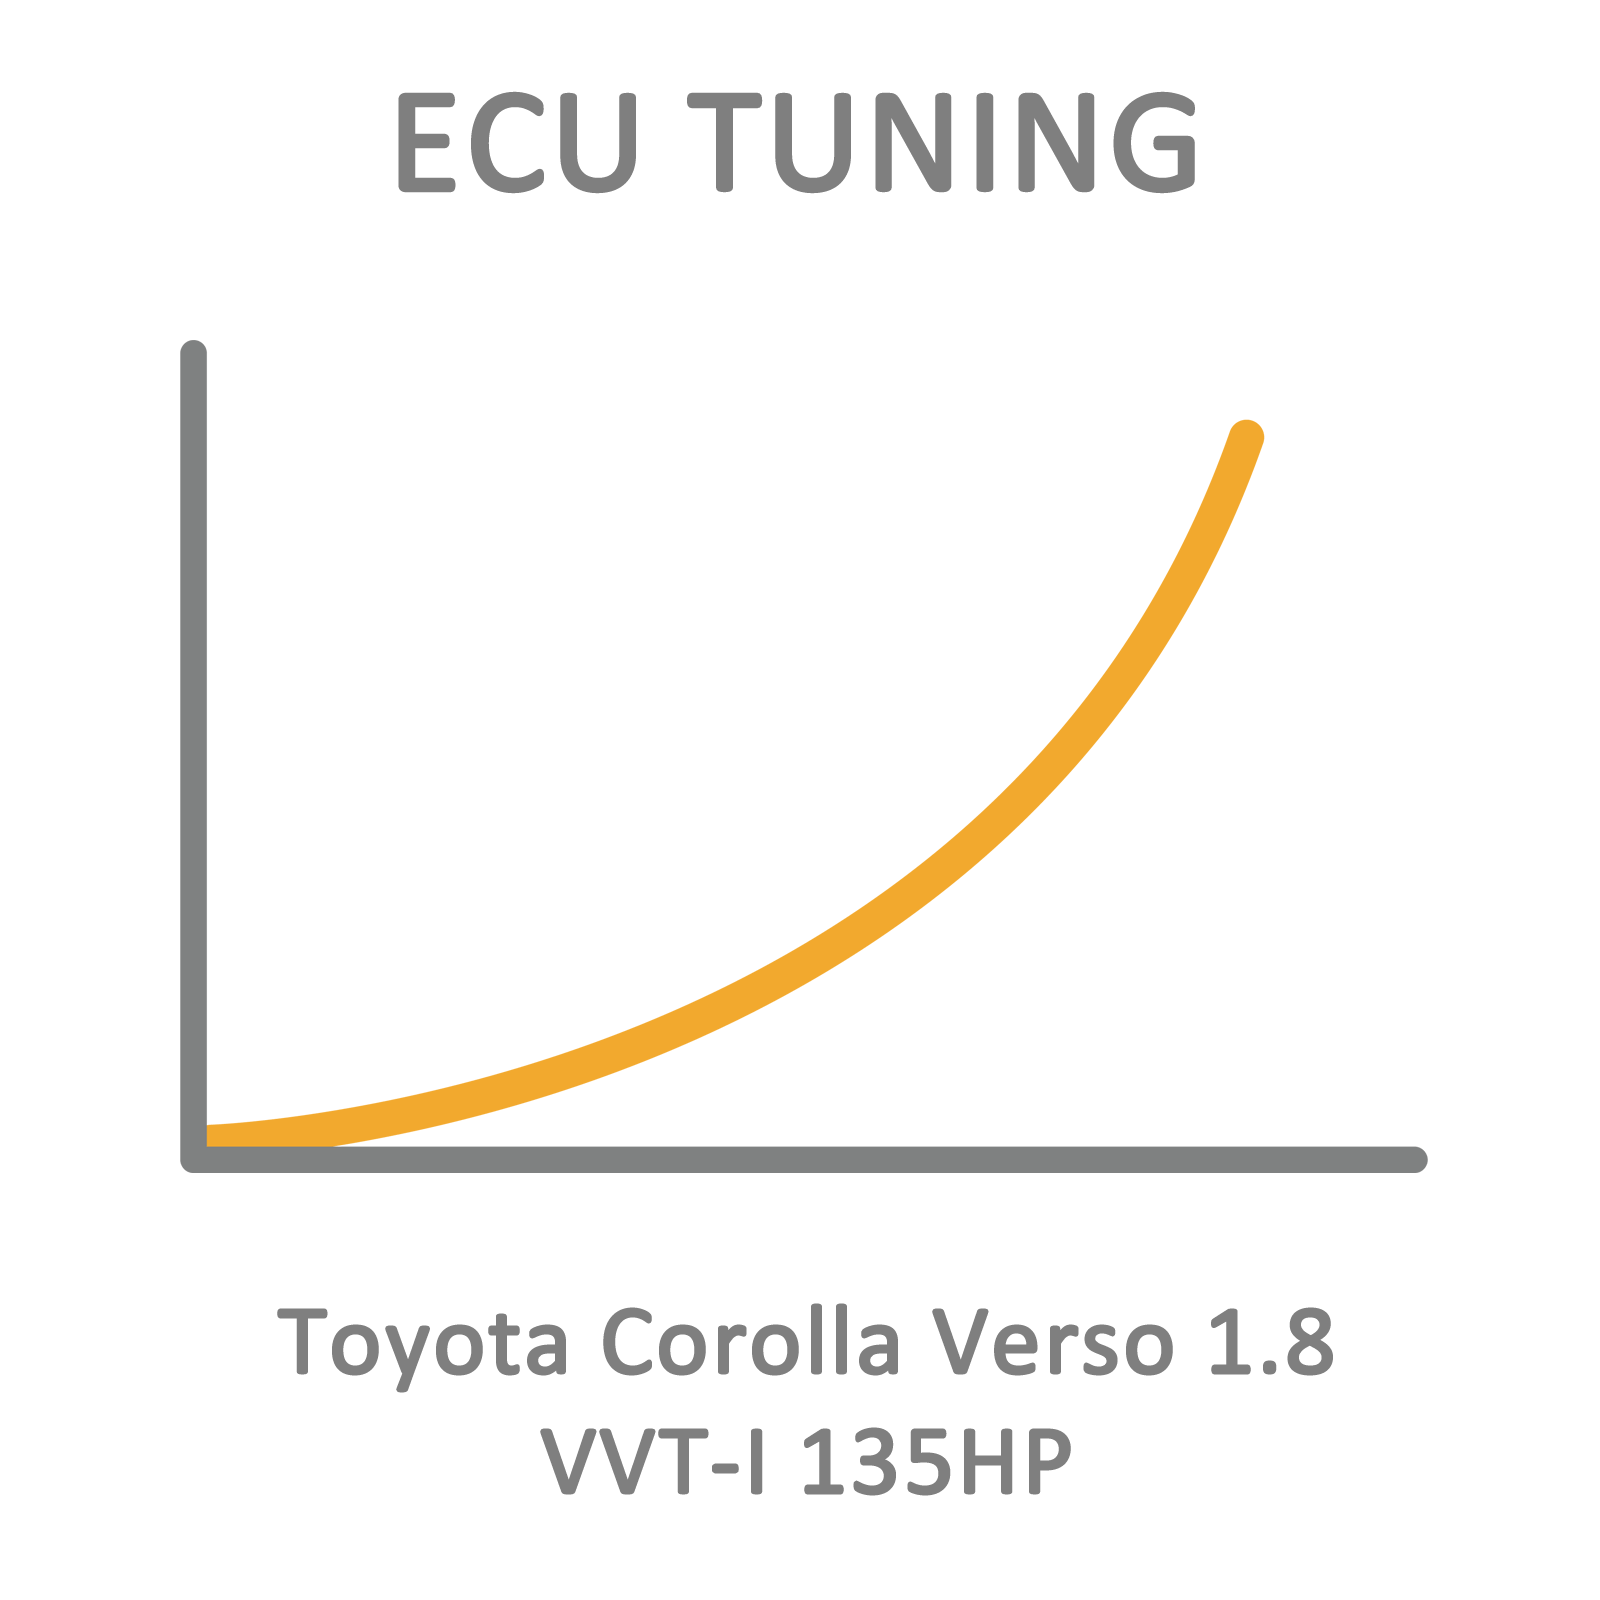 Toyota Corolla Verso 1.8 VVT-I 135HP ECU Tuning Remapping